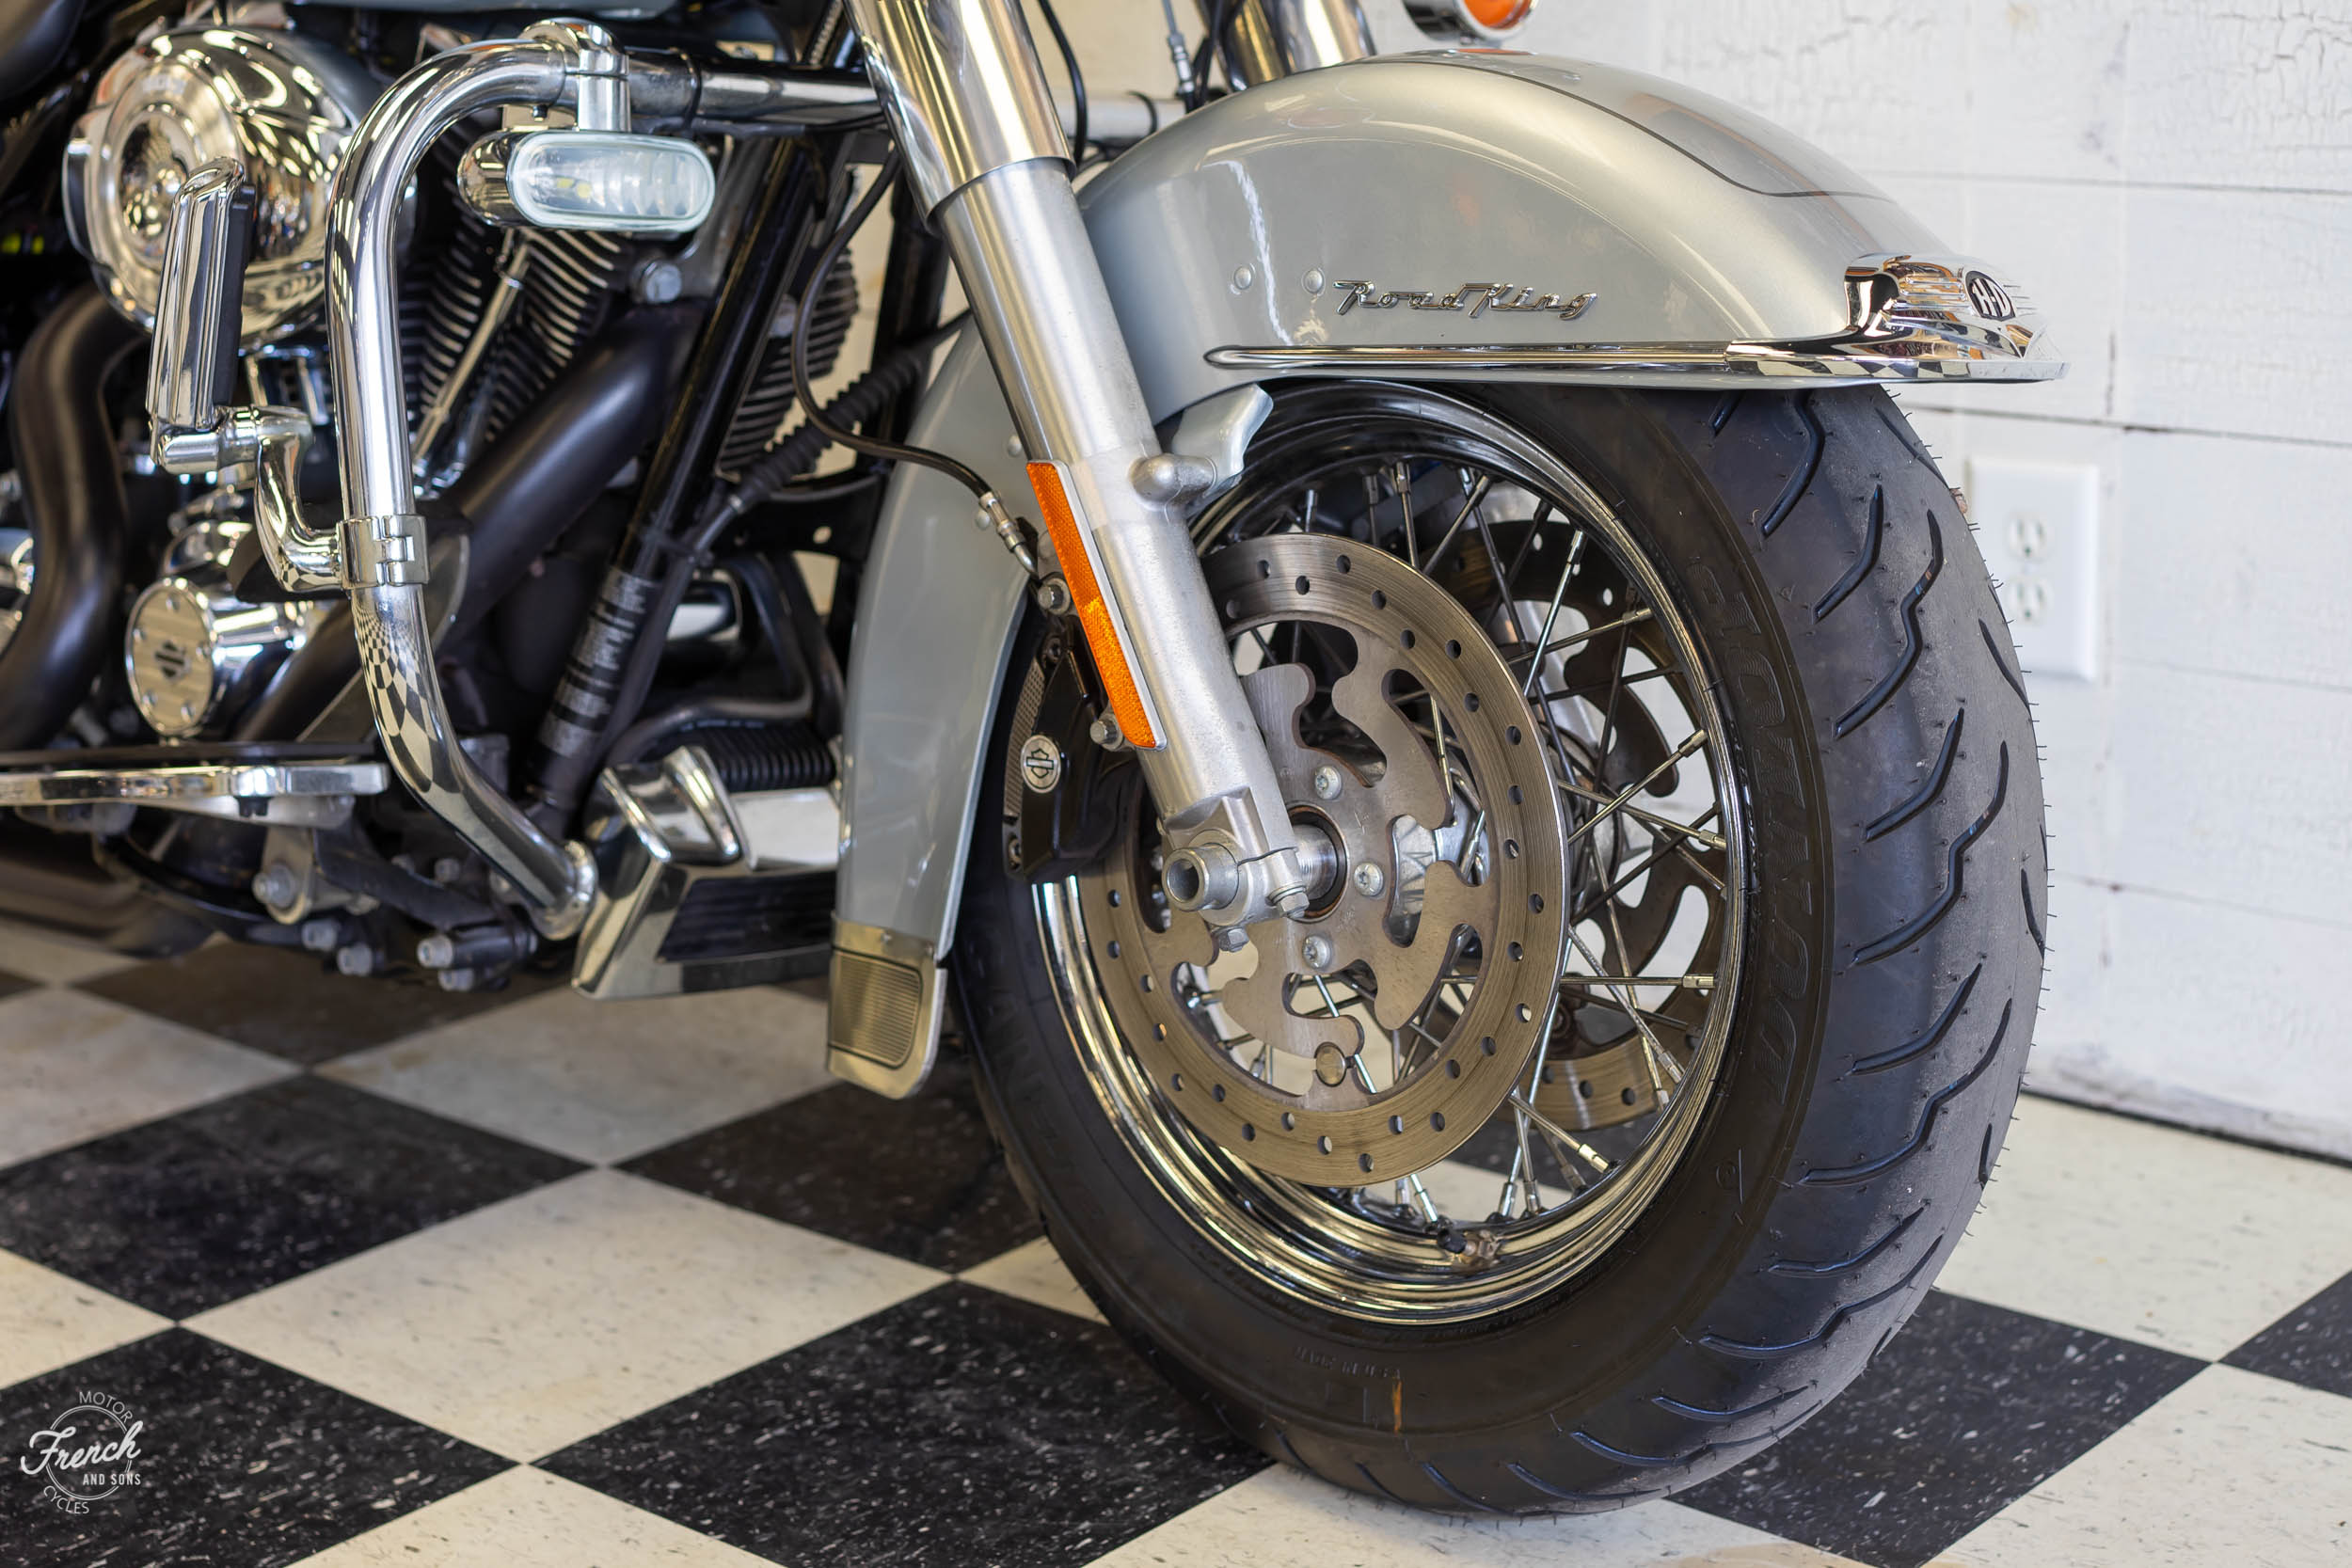 2011_Harley_davidson_road_king_silver-13.jpg